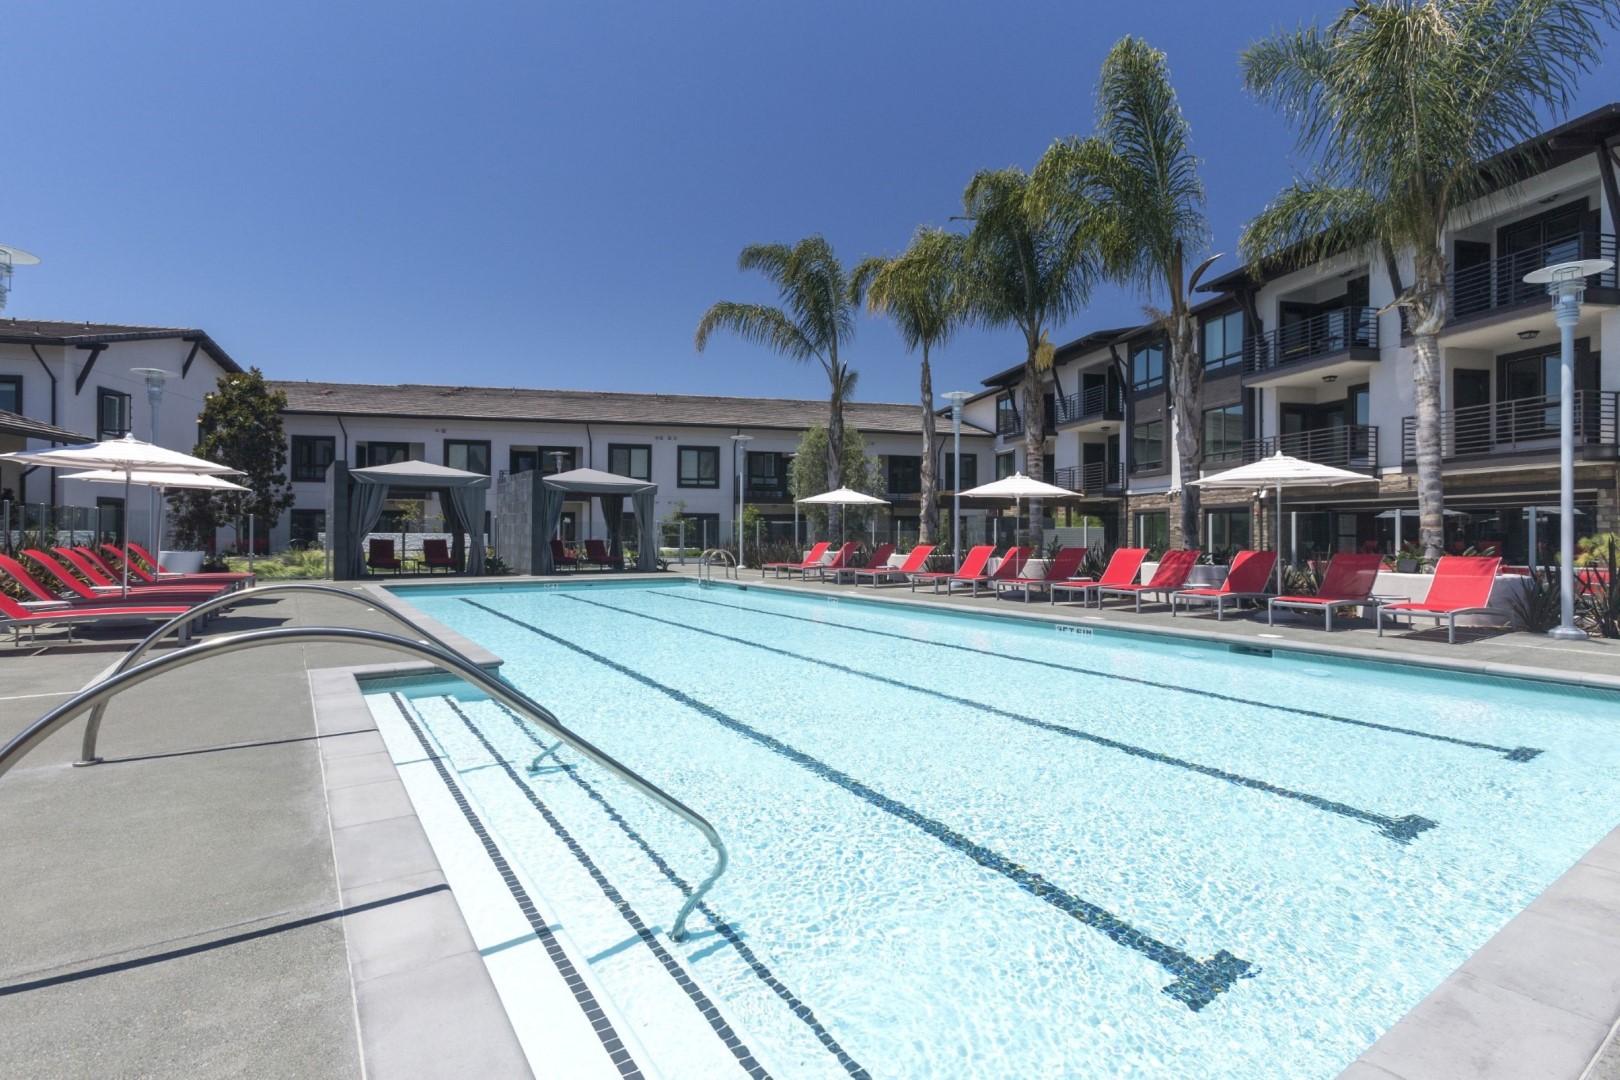 Pool at Anton Apartments, Lakewood, Sunnyvale